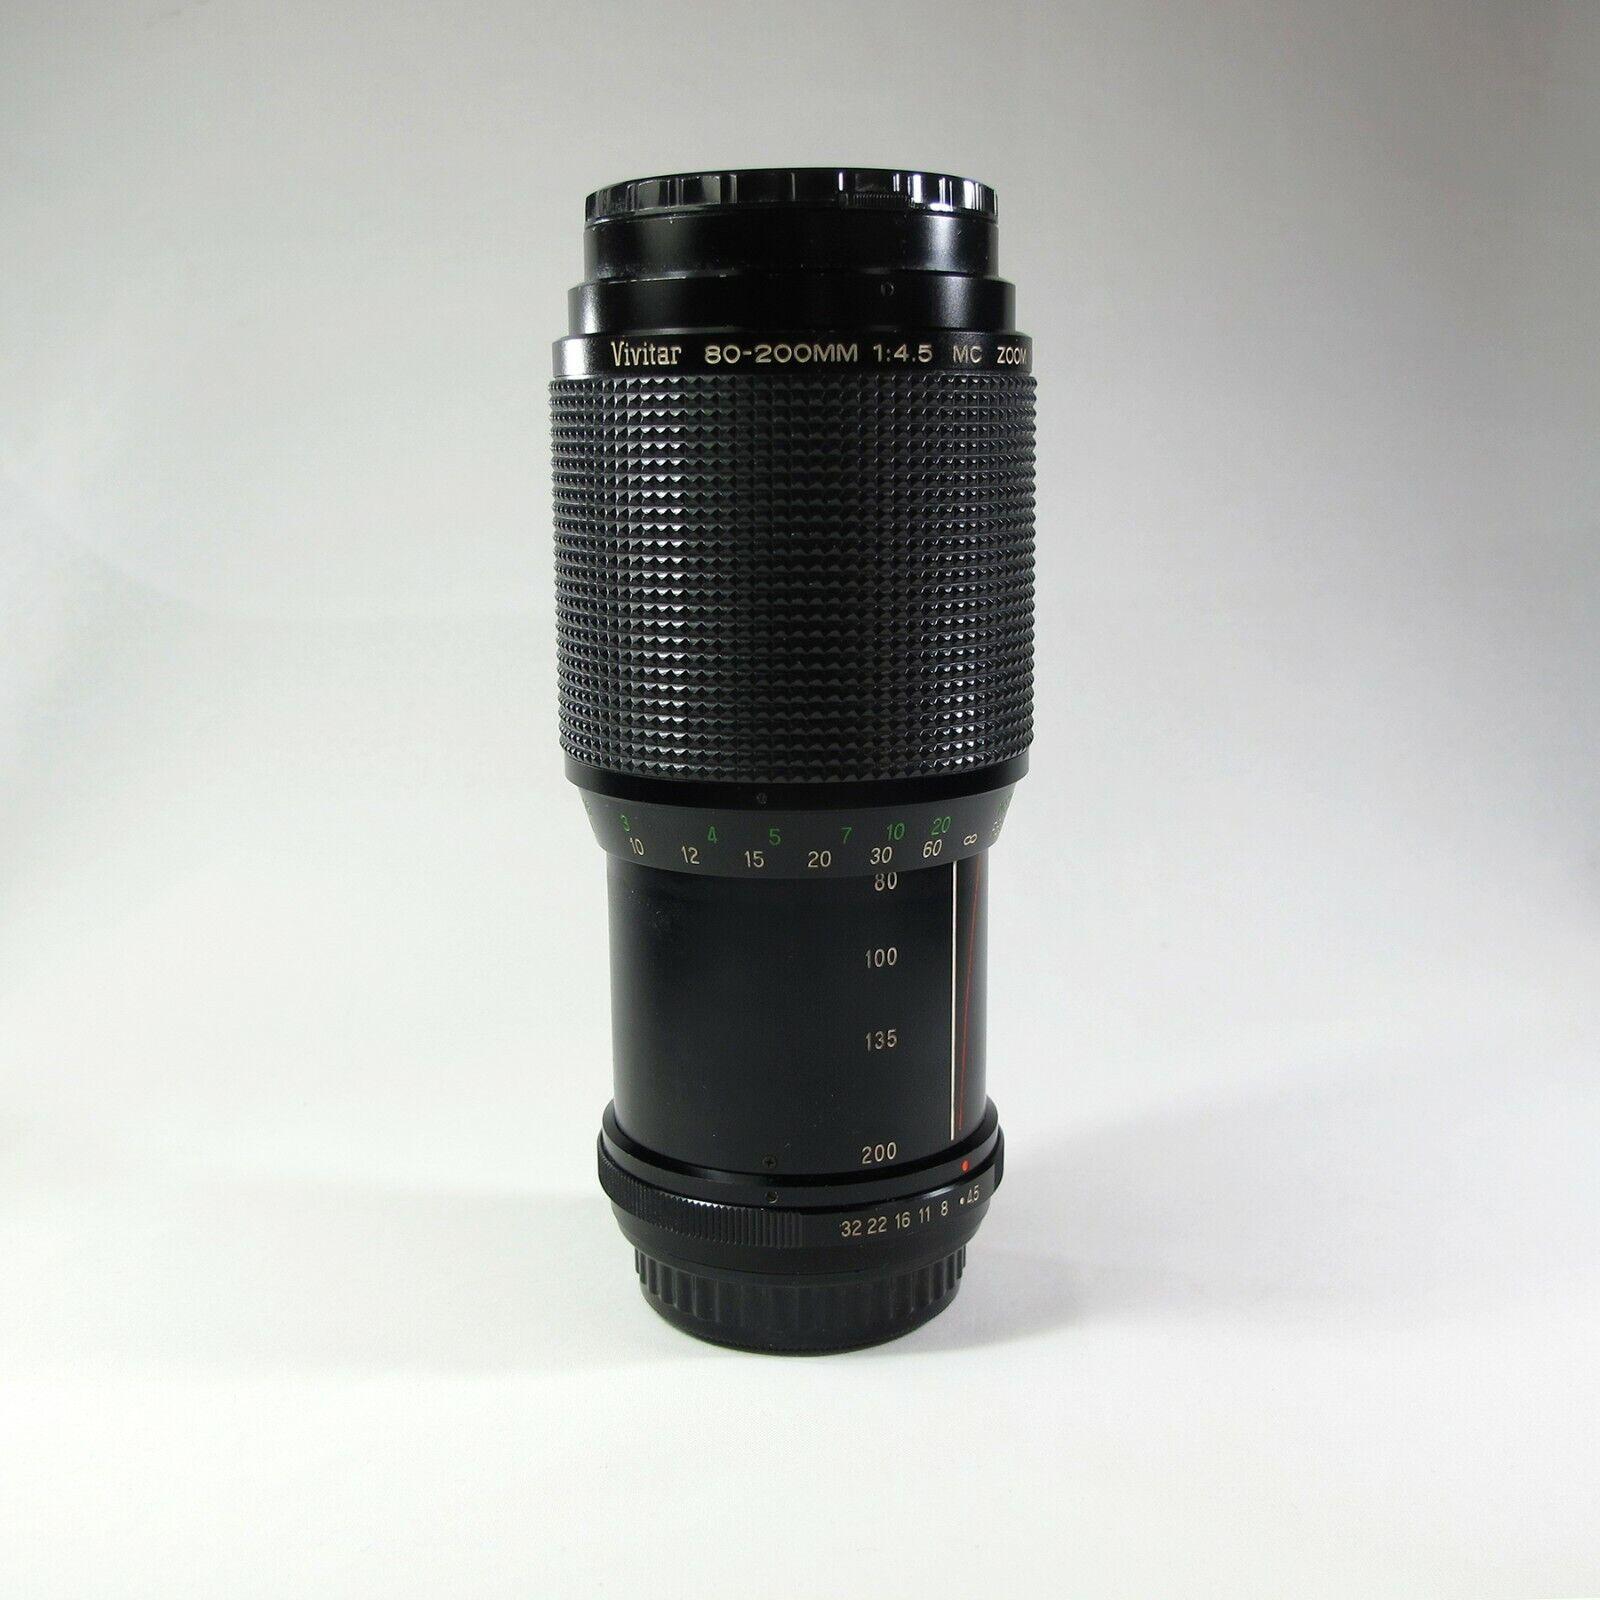 OBJETIVO PARA PENTAX 80-200MM f4.5-Defectuoso